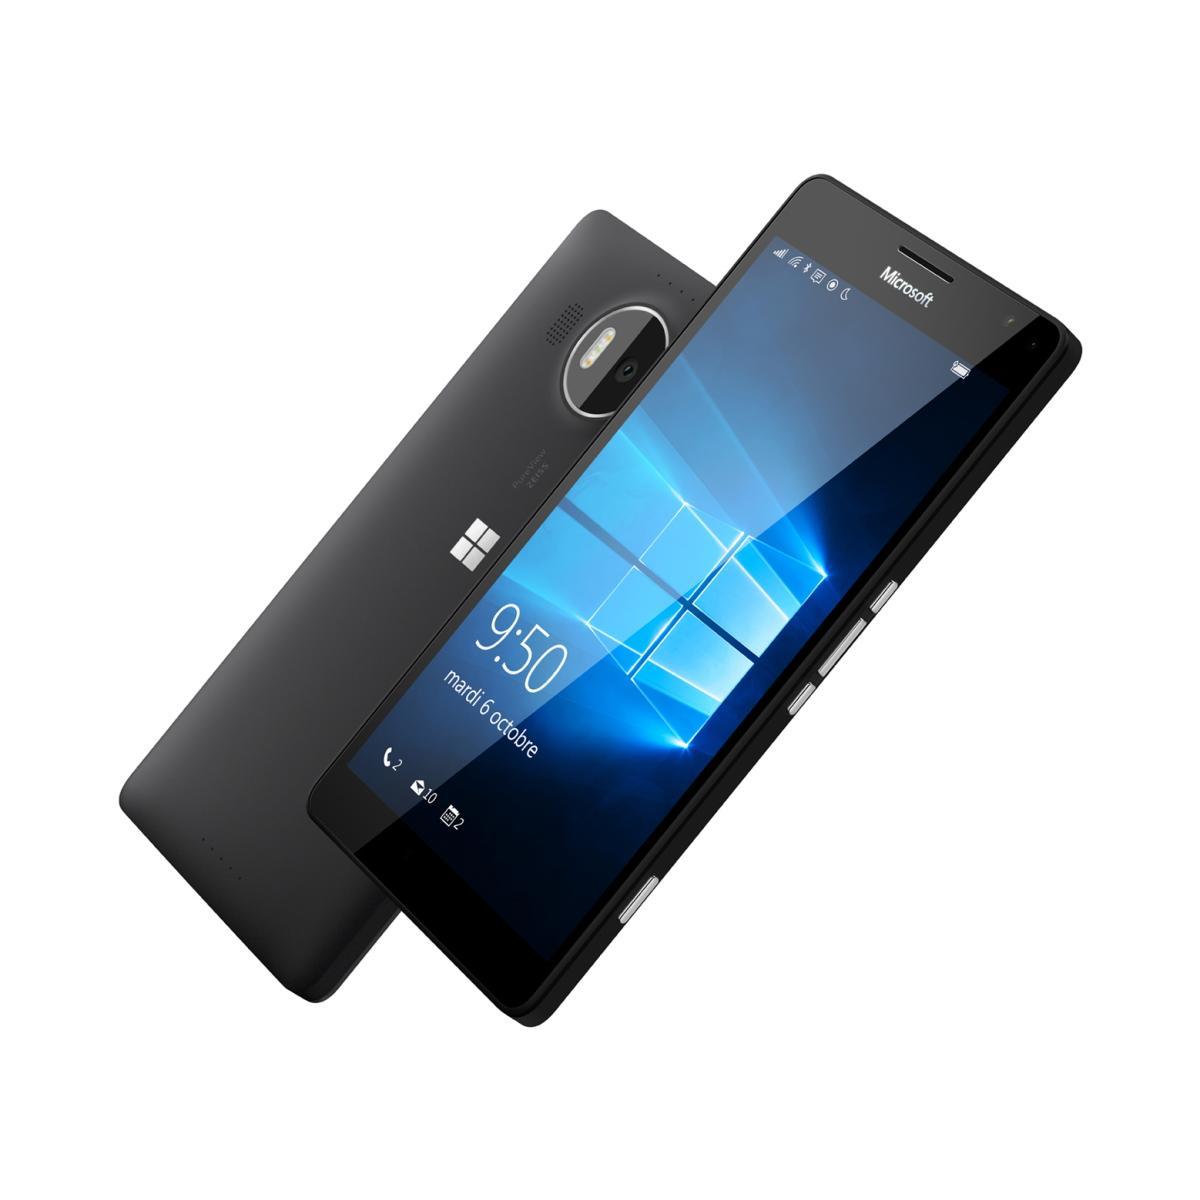 Nokia Lumia 950 XL 32 Gb - Negro - Libre